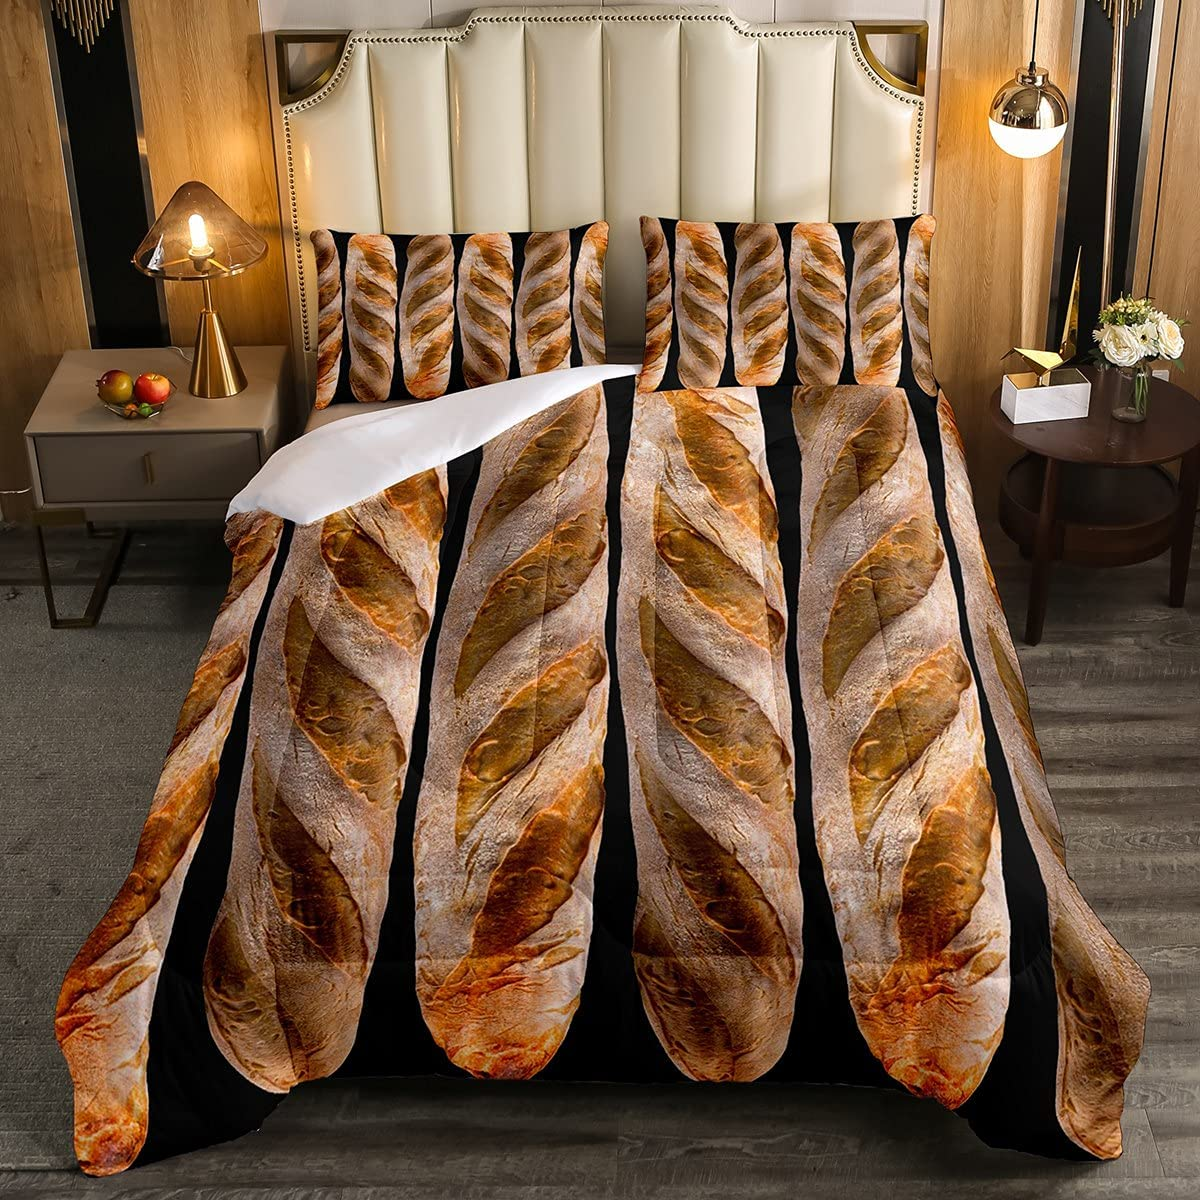 Erosebridal Baguette Popular overseas Duvet Sets 3D Set French Sale special price Bread Comforter Ba